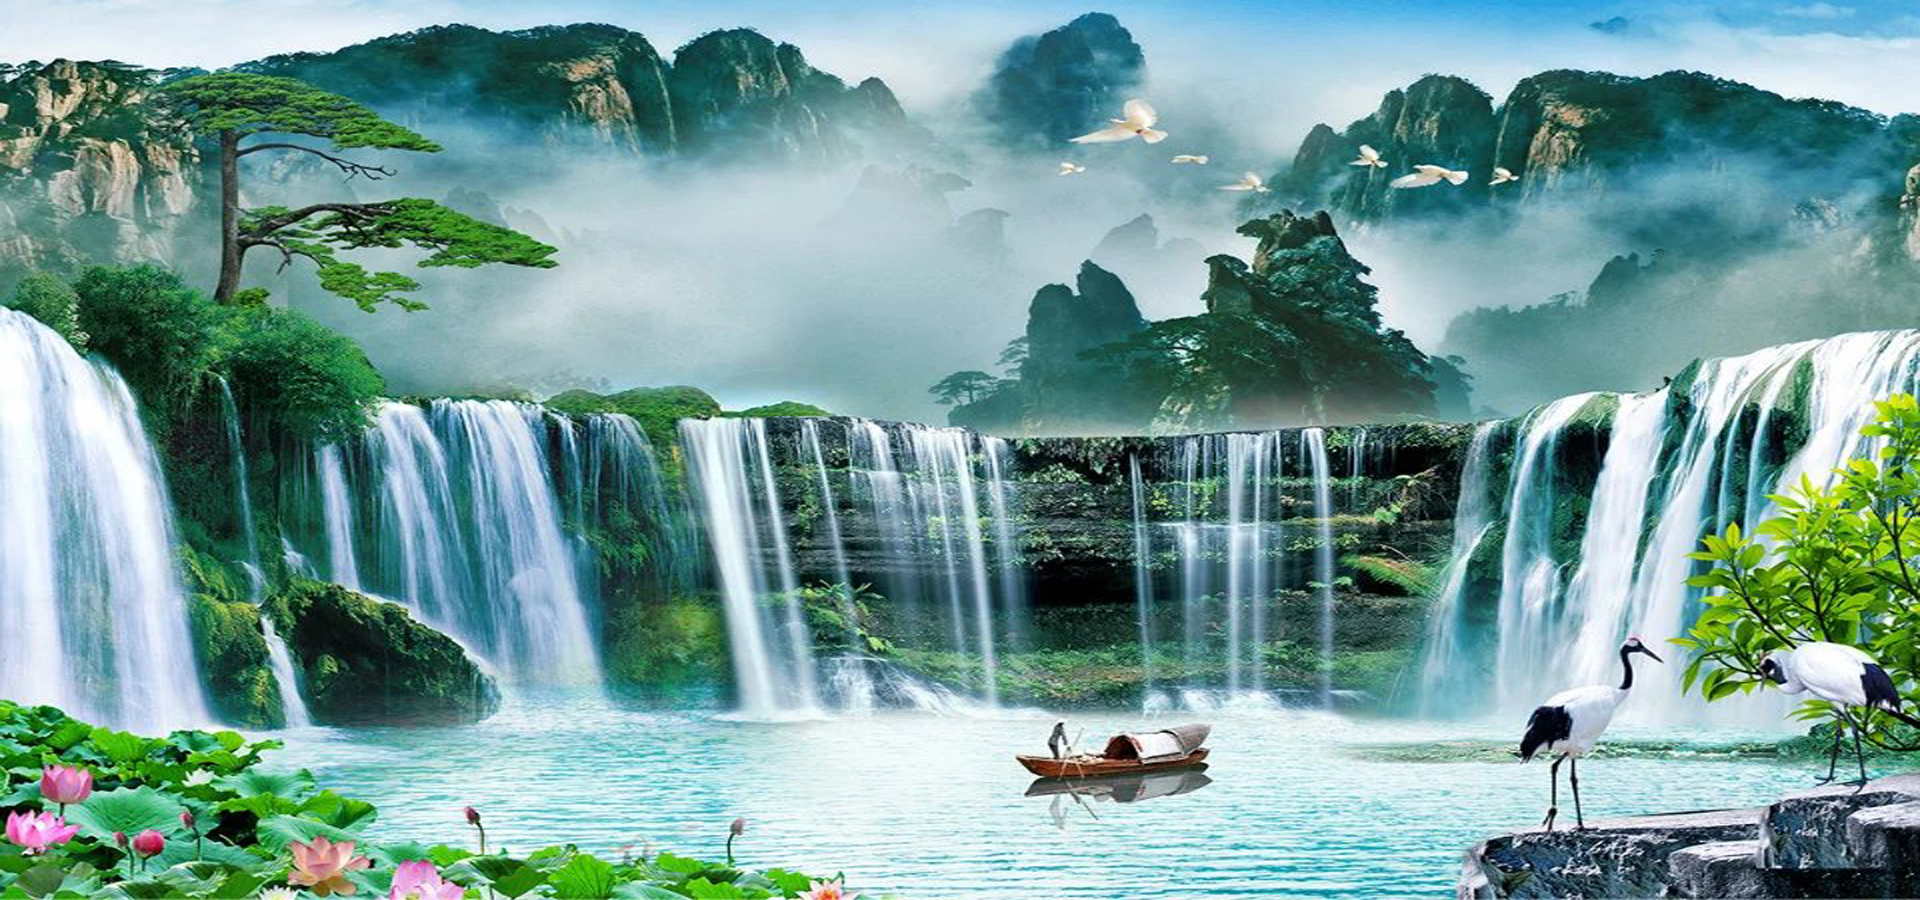 Pinturas de paisajes hermosa cascada piedra imagen de for Cascadas con piedras